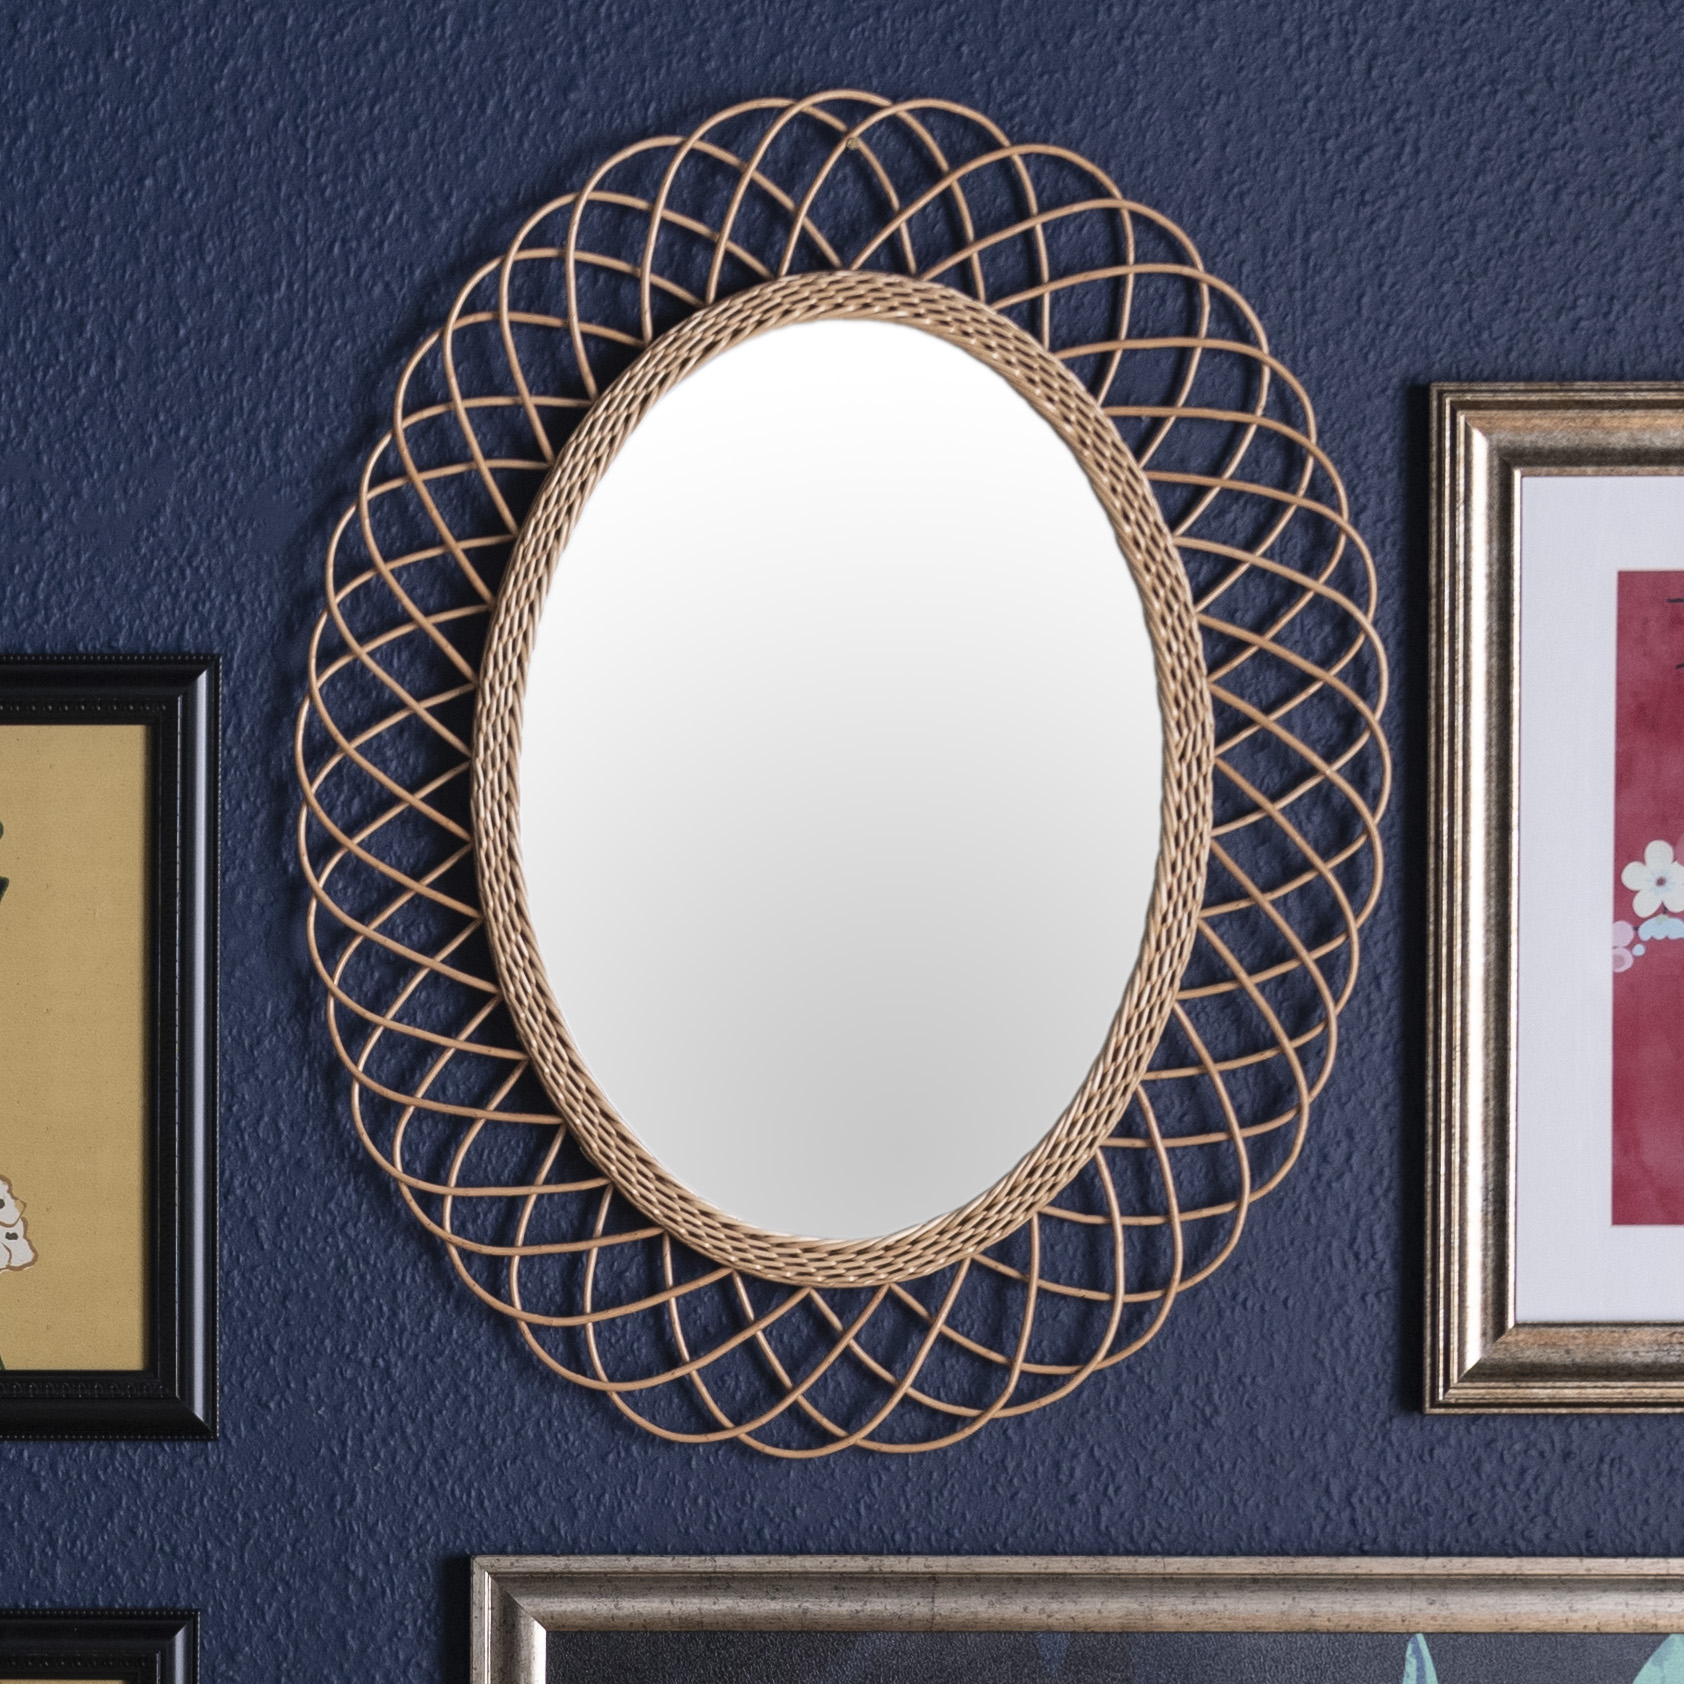 drew barrymore flower home mirror